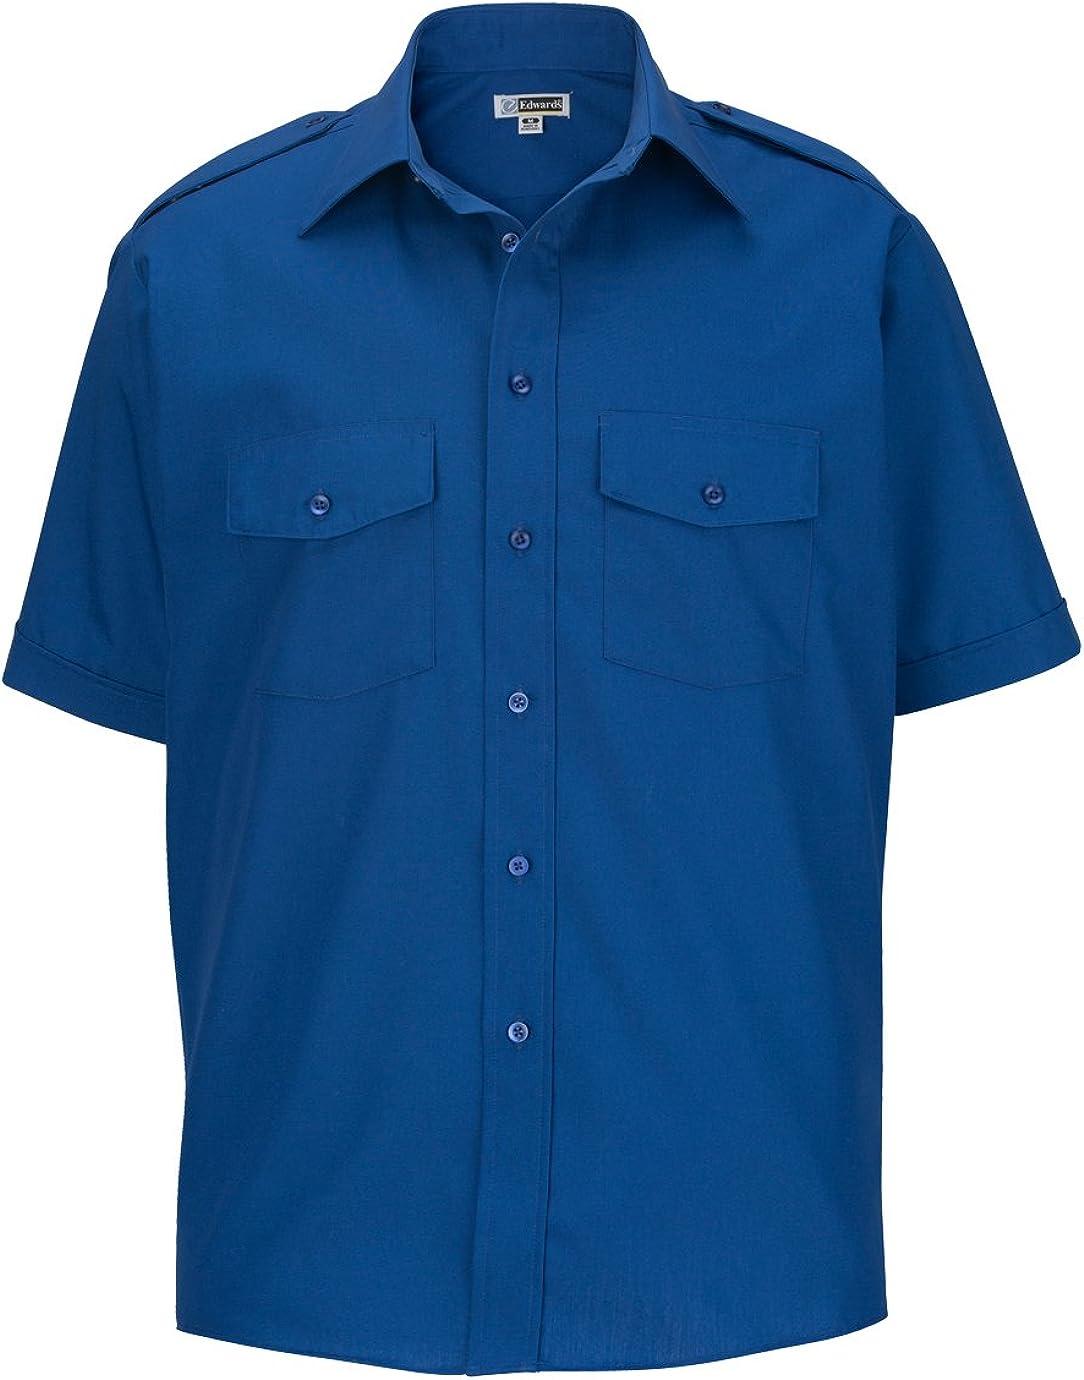 Edwards Short Sleeve Safari Shirt